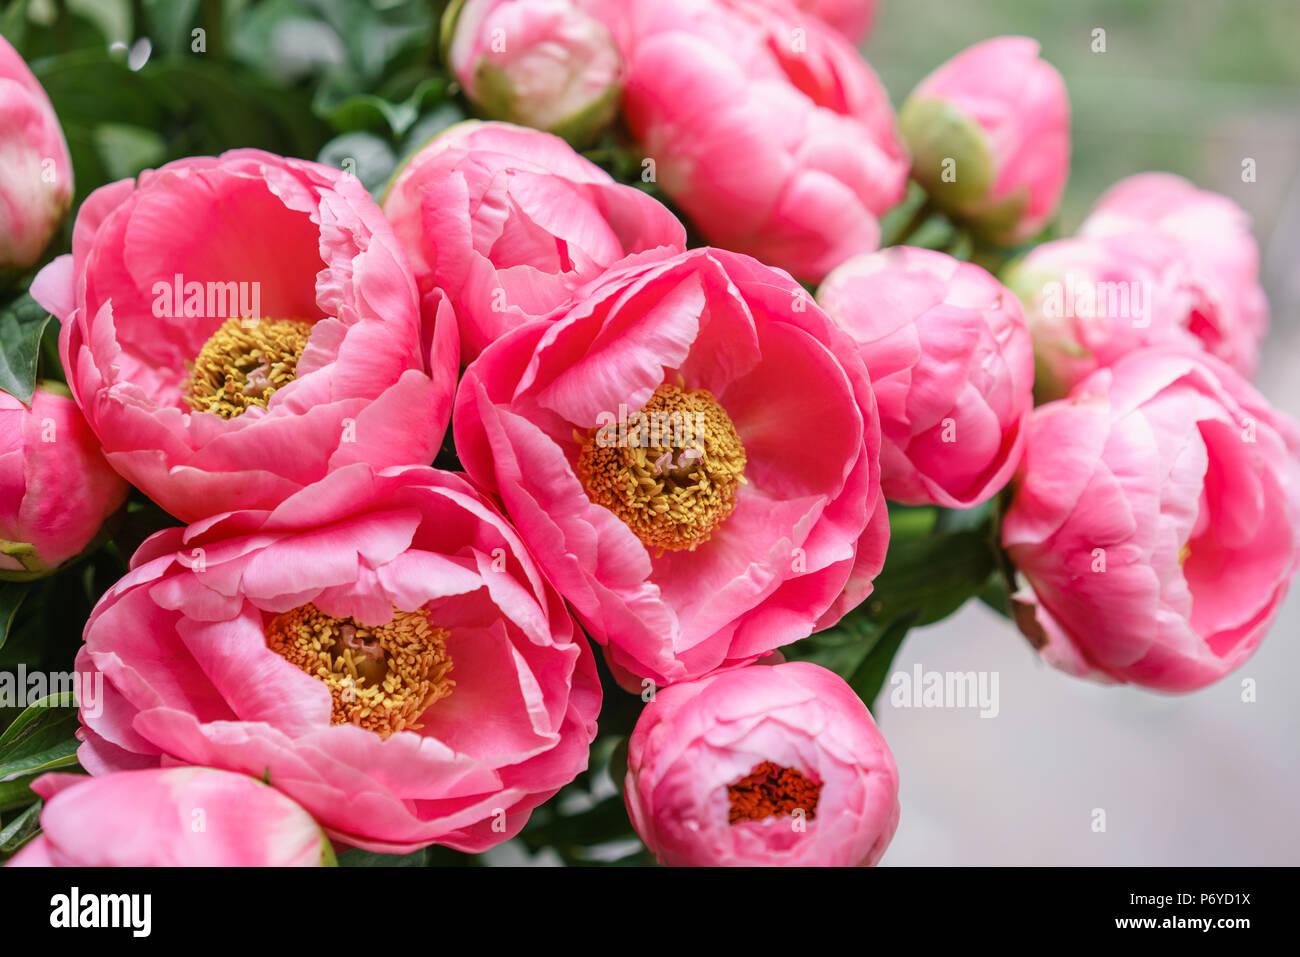 Carta Da Parati Fiori Rosa : Peonie rosa. bella estate bouquet. composizione floreale. carta da